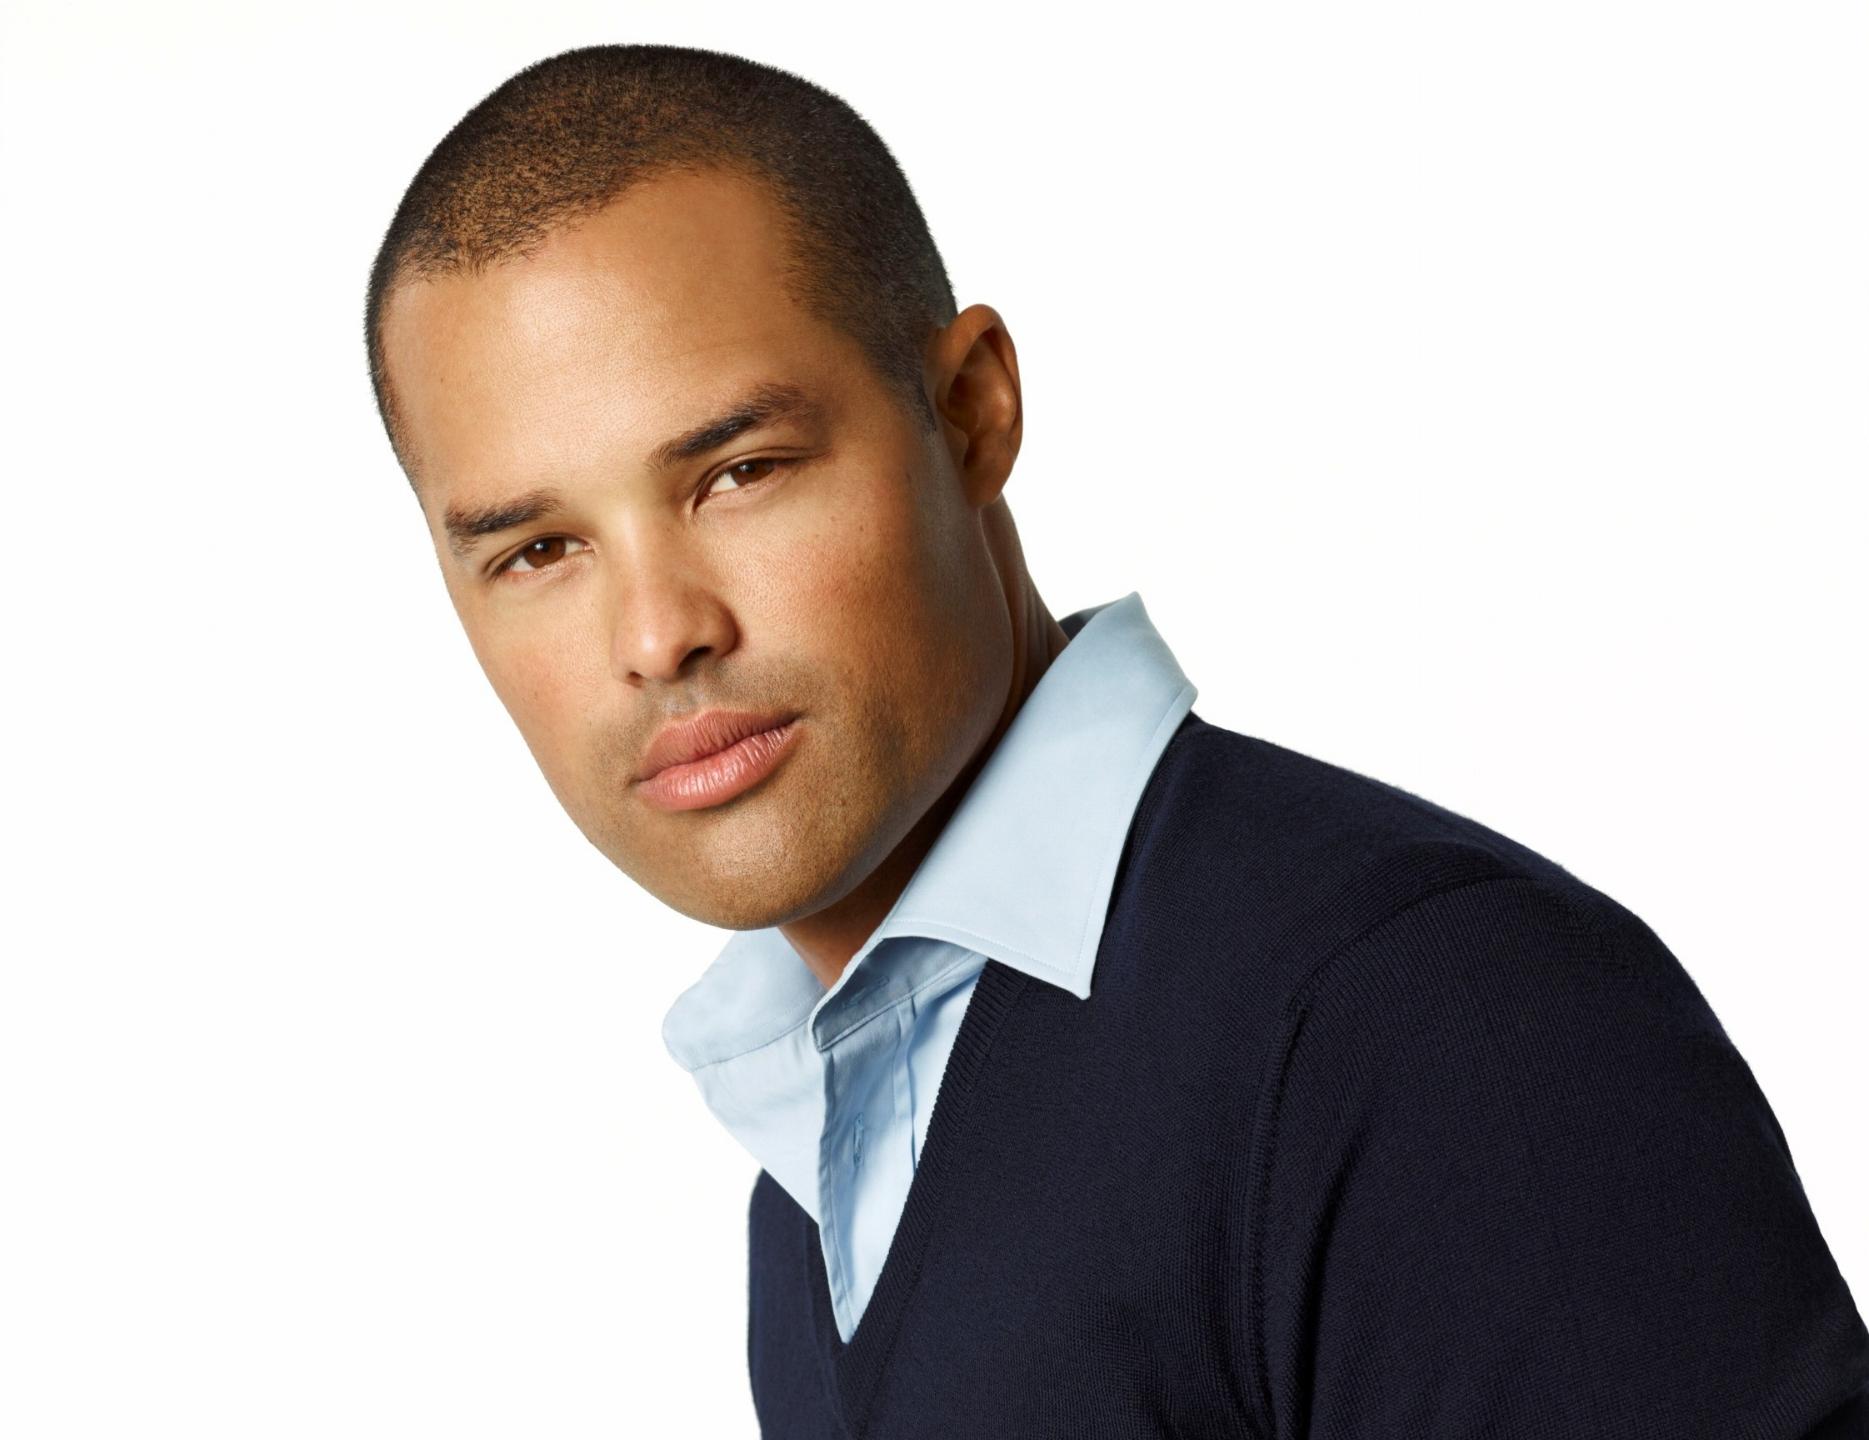 Jason Lawrence Olive as Derrick Lawrence